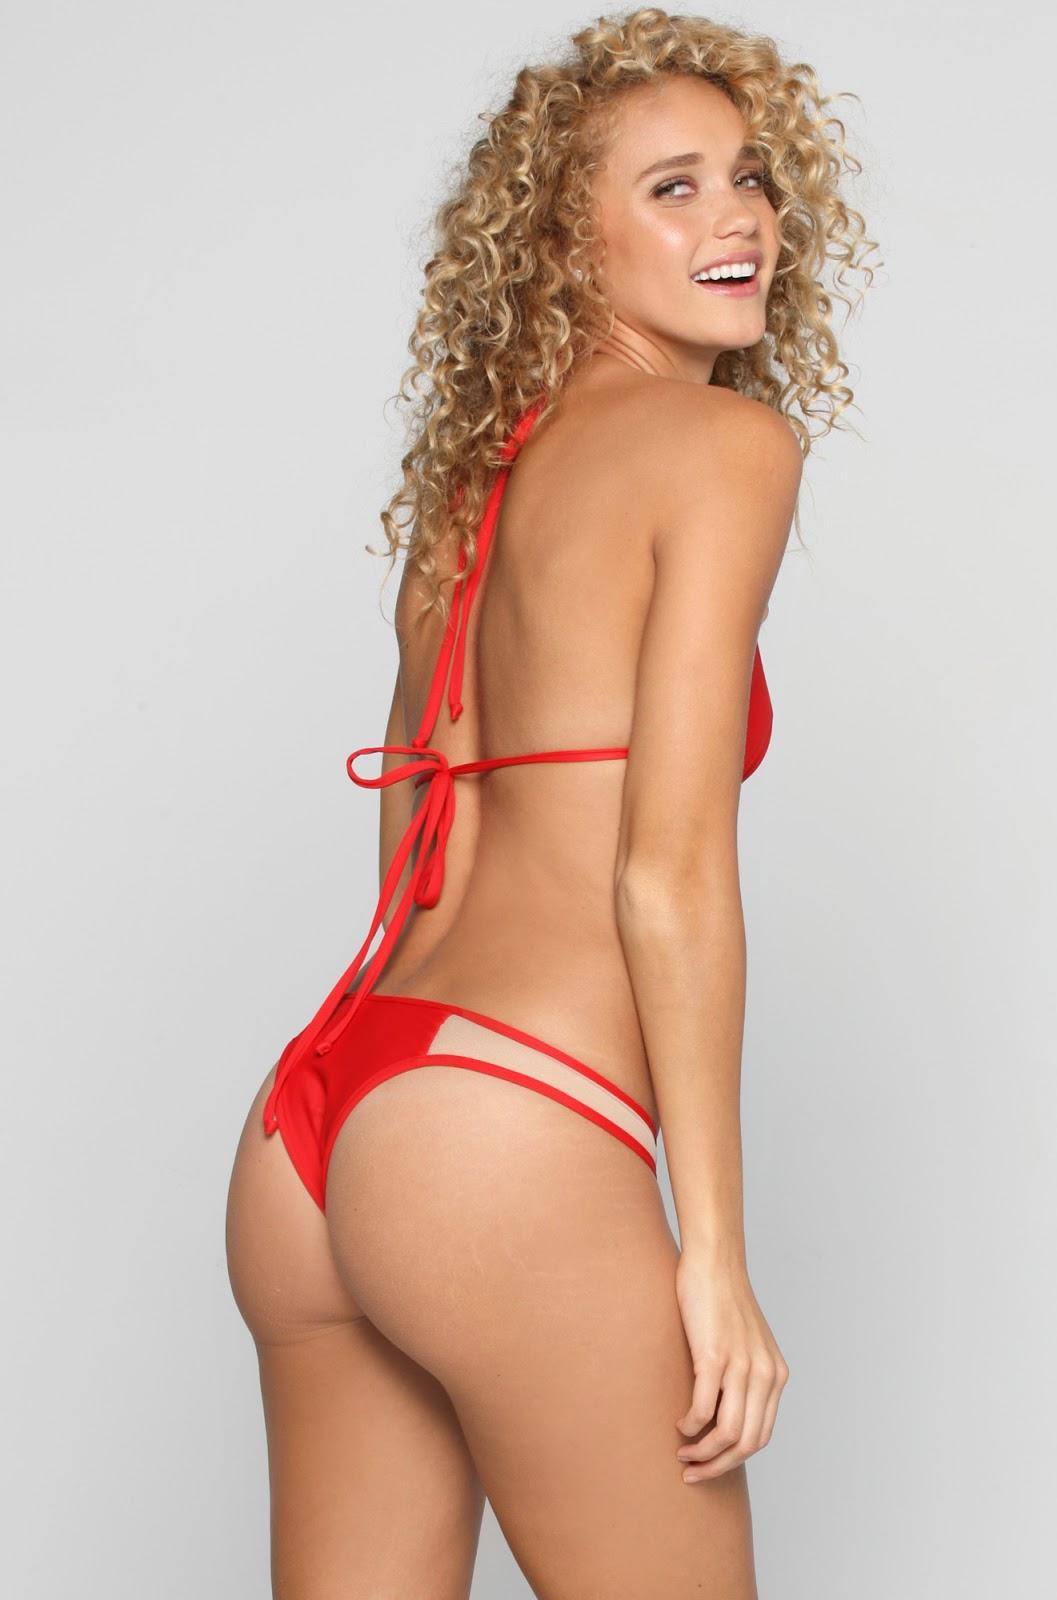 Bikini Allie Silva nude photos 2019